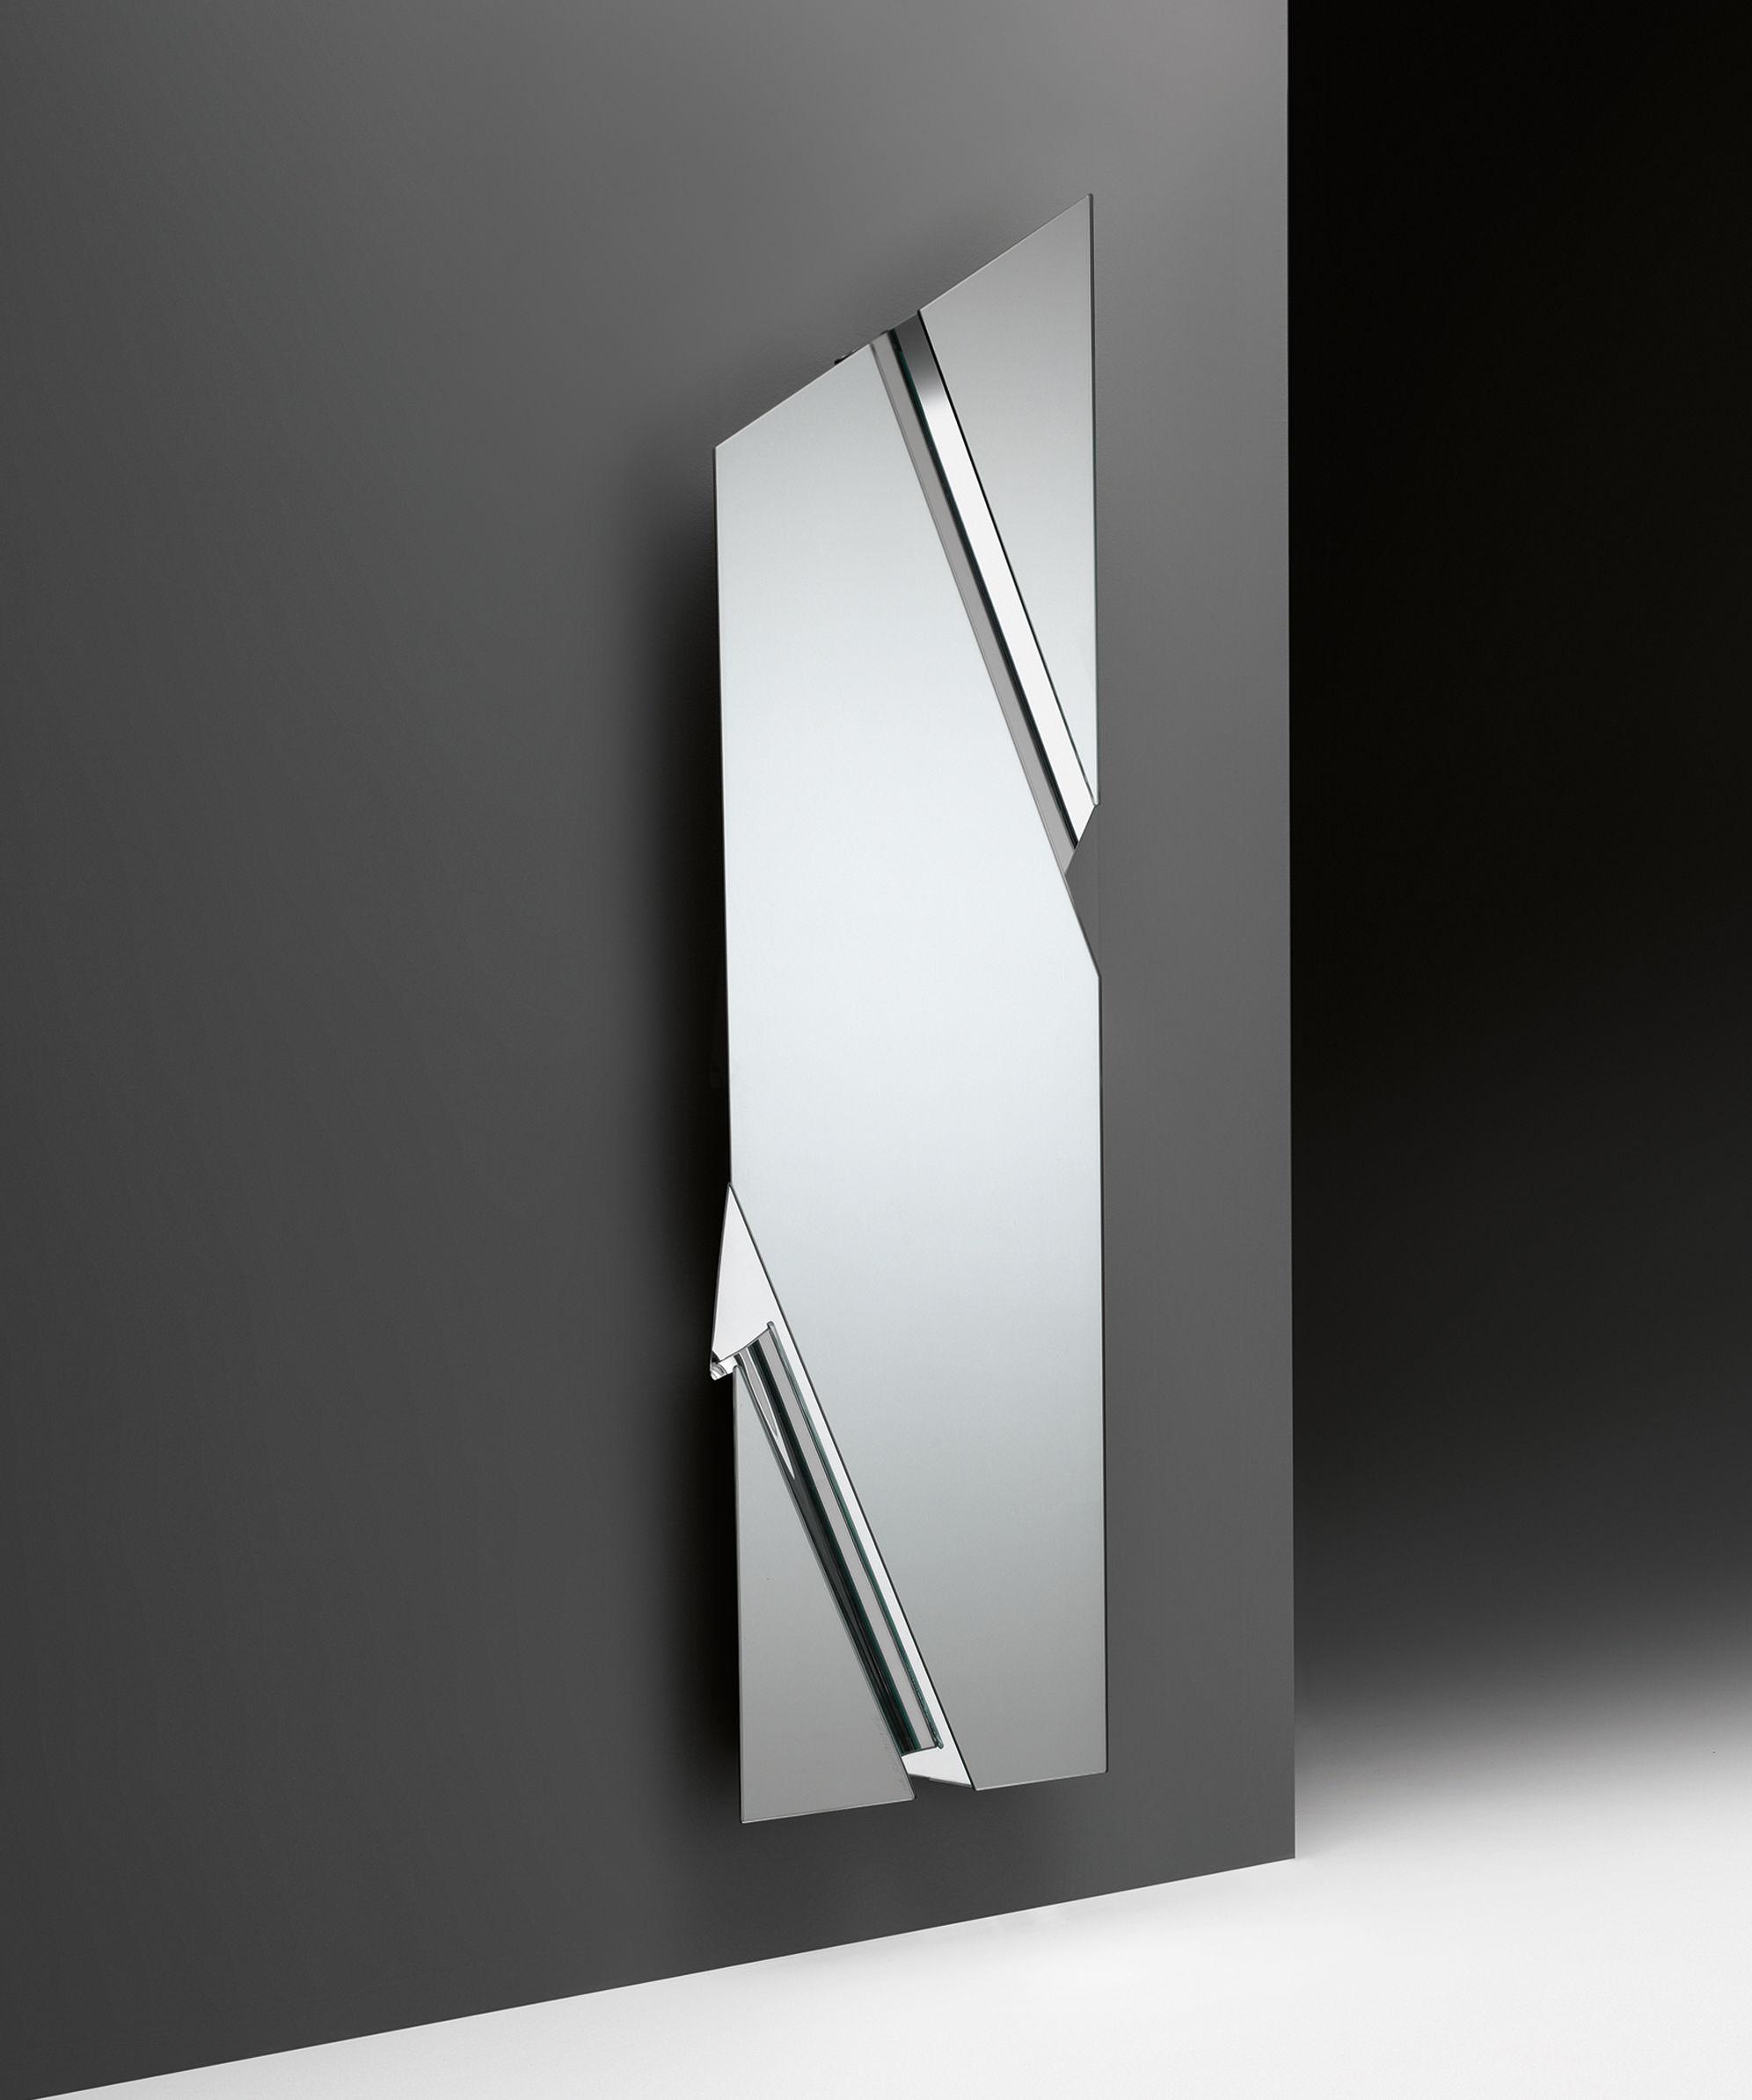 miroir the wing 200 x 53 cm miroir fiam. Black Bedroom Furniture Sets. Home Design Ideas